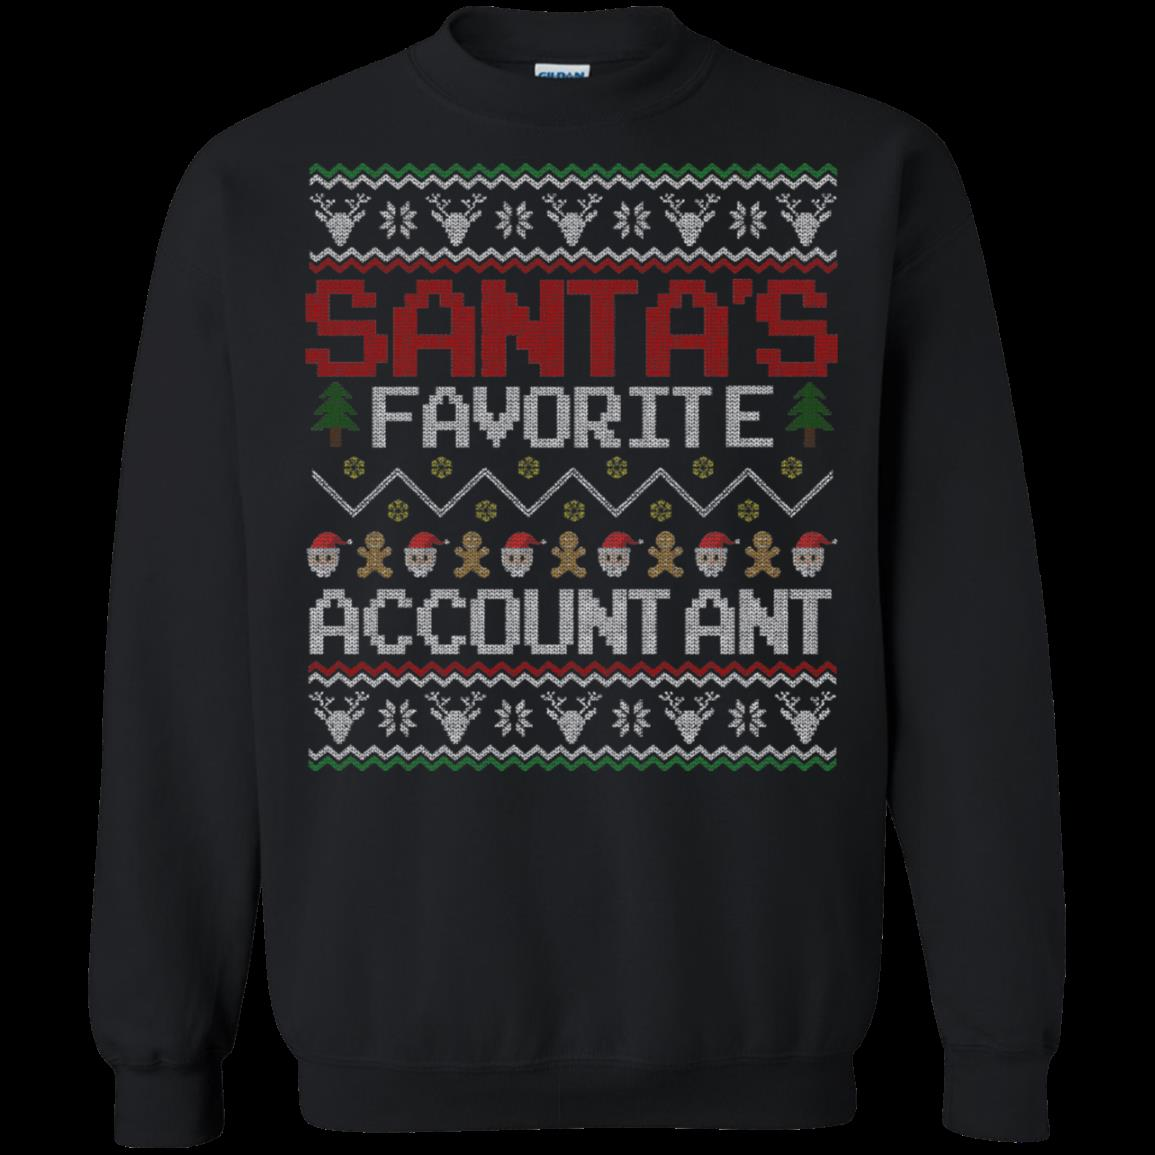 Accountant Christmas Ugly Sweater Shirts Santa Favorite T Shirt Hoodies Sweatshirt